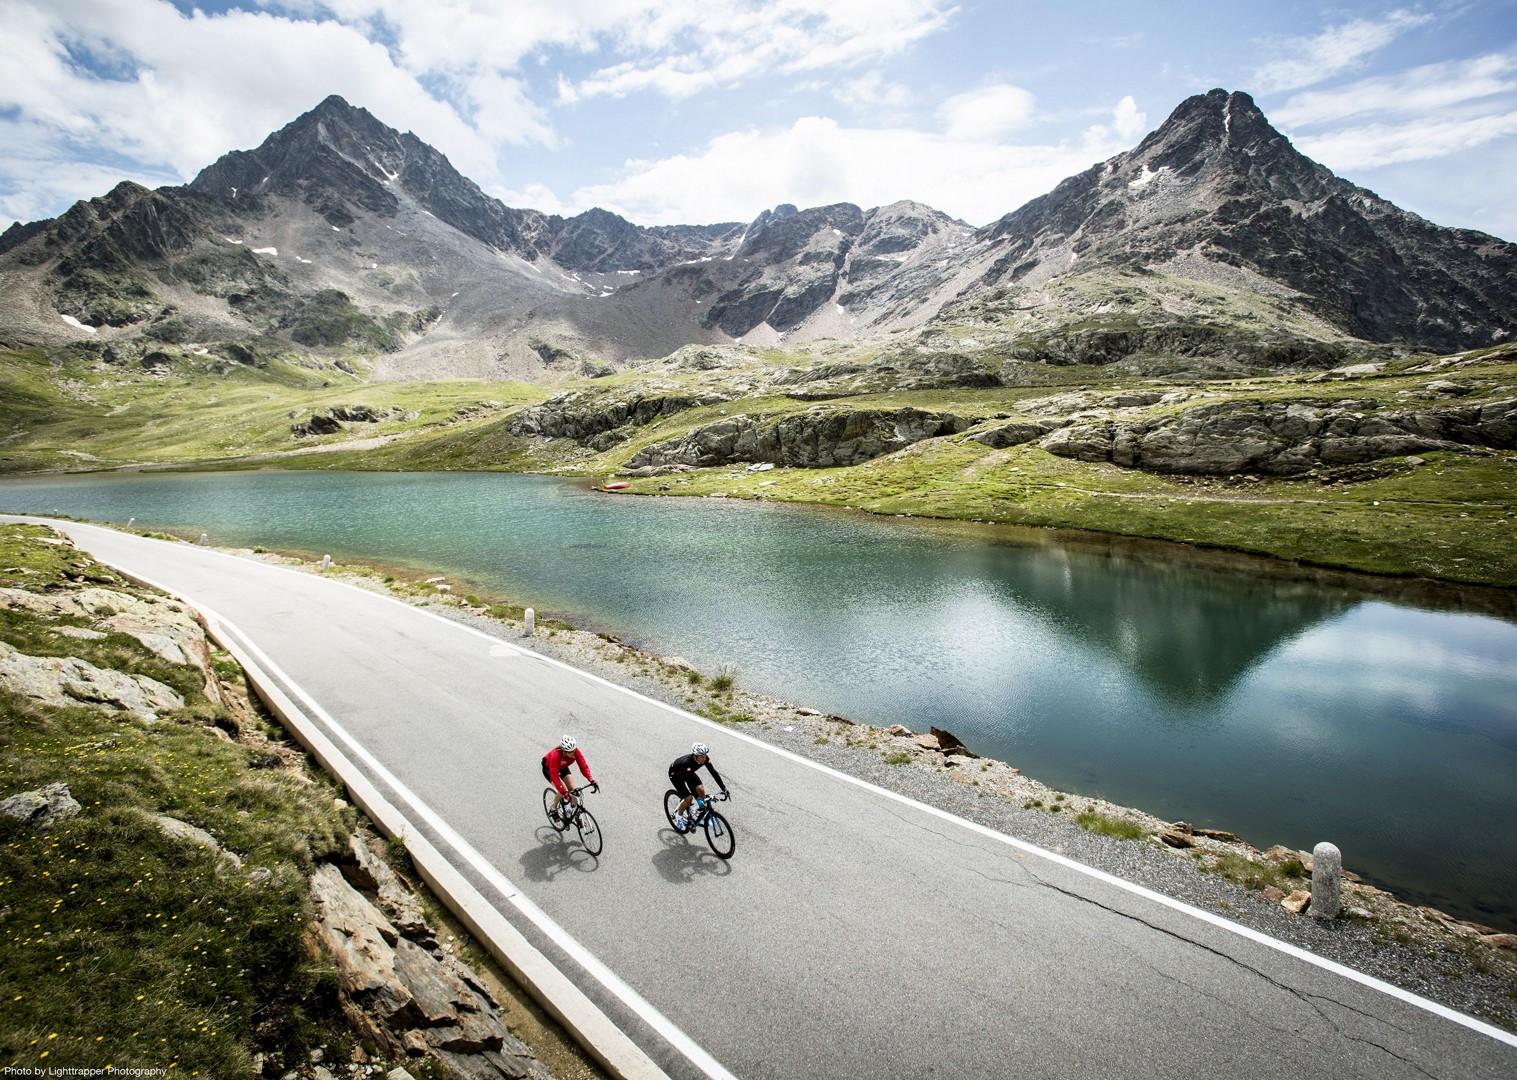 gavia-guided-road-cycling-holiday.jpg - Italy - Italian Alps Introduction - Guided Road Cycling Holiday - Road Cycling